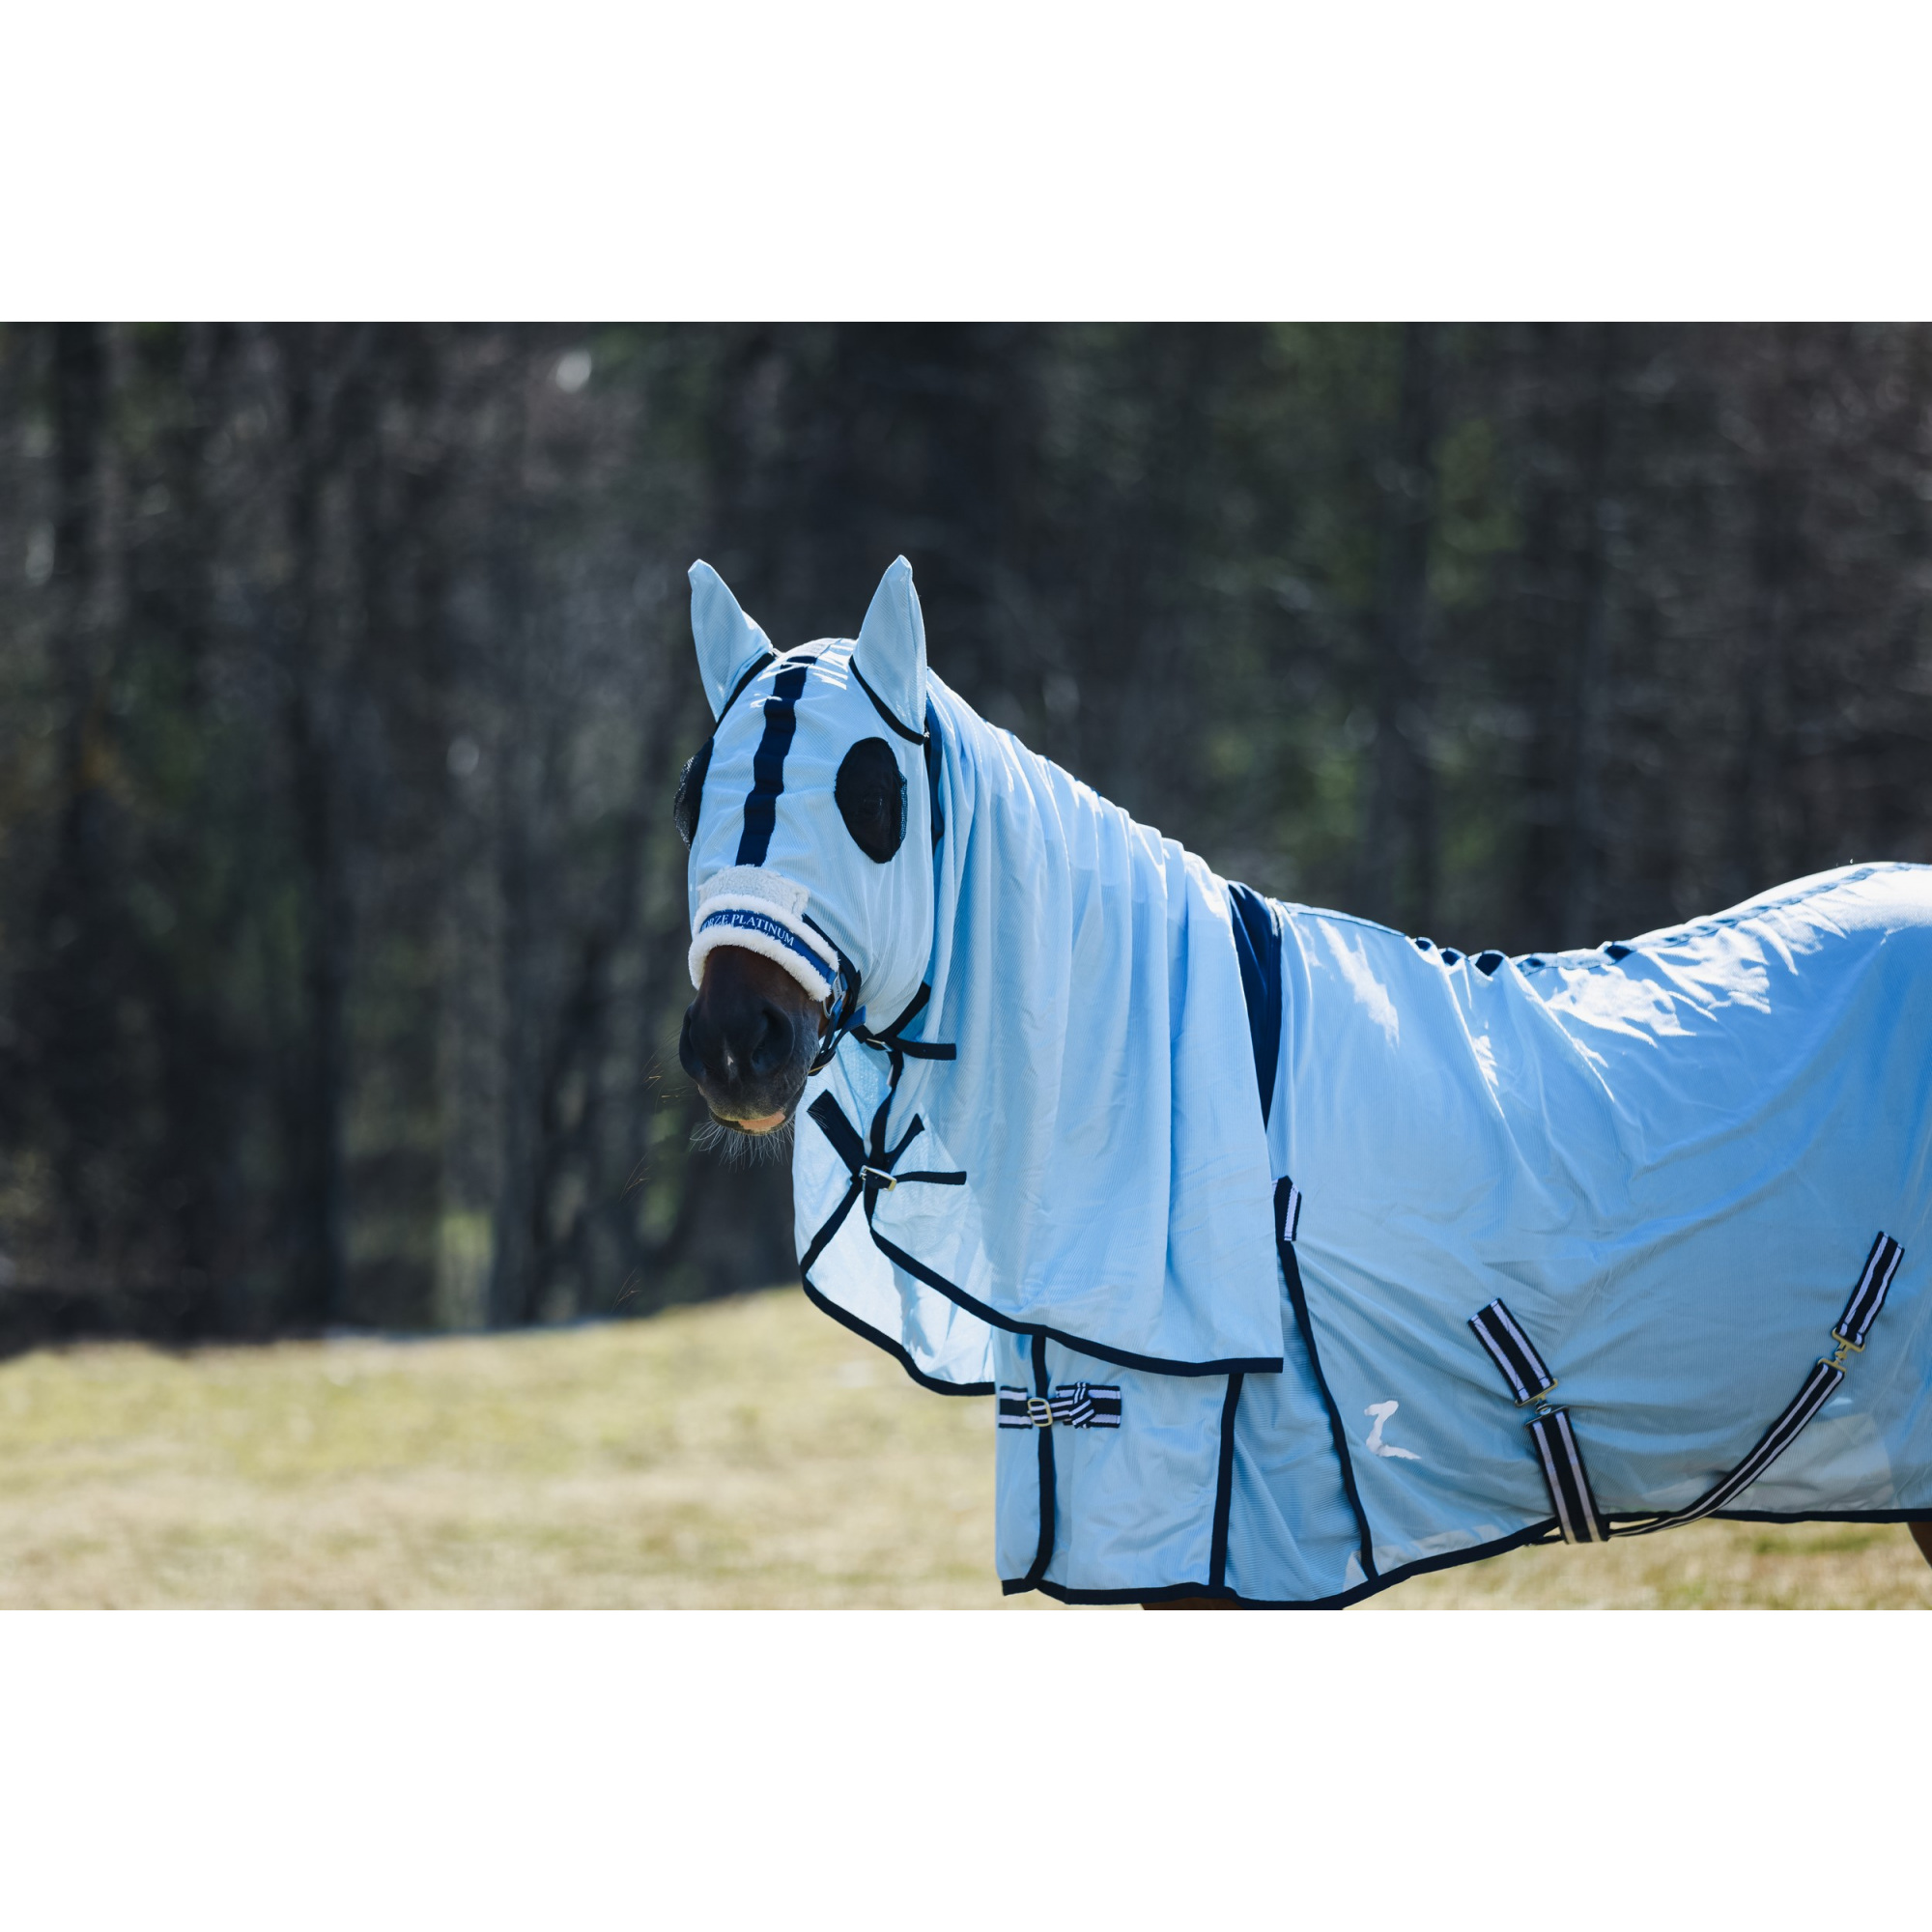 bug rug//detachable neck//UV protection//horze freja fly rug fly rug//mesh fly